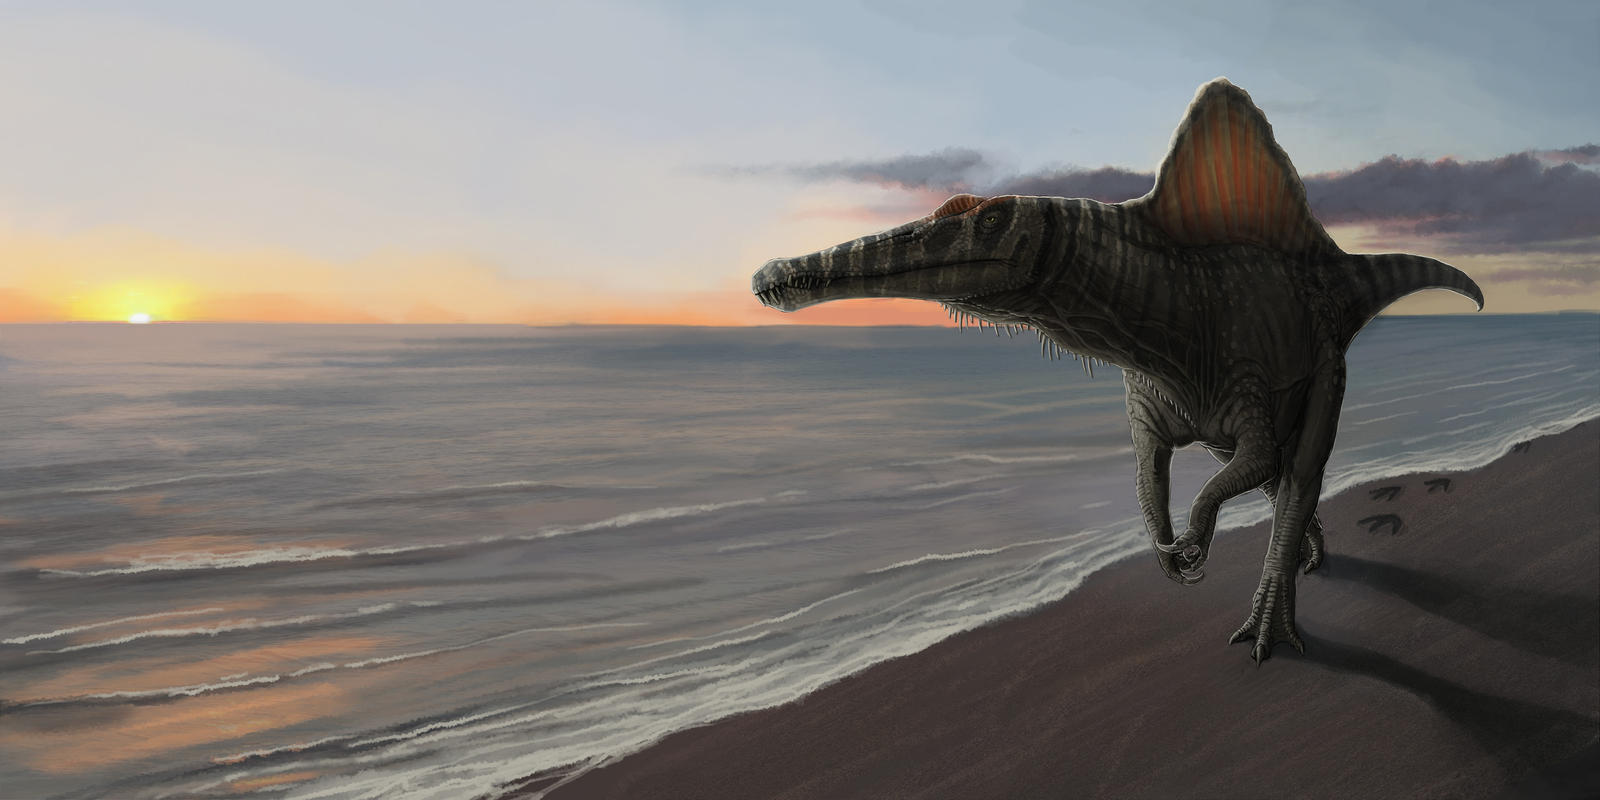 Paleo art - spinosaurus by FabrizioDeRossi